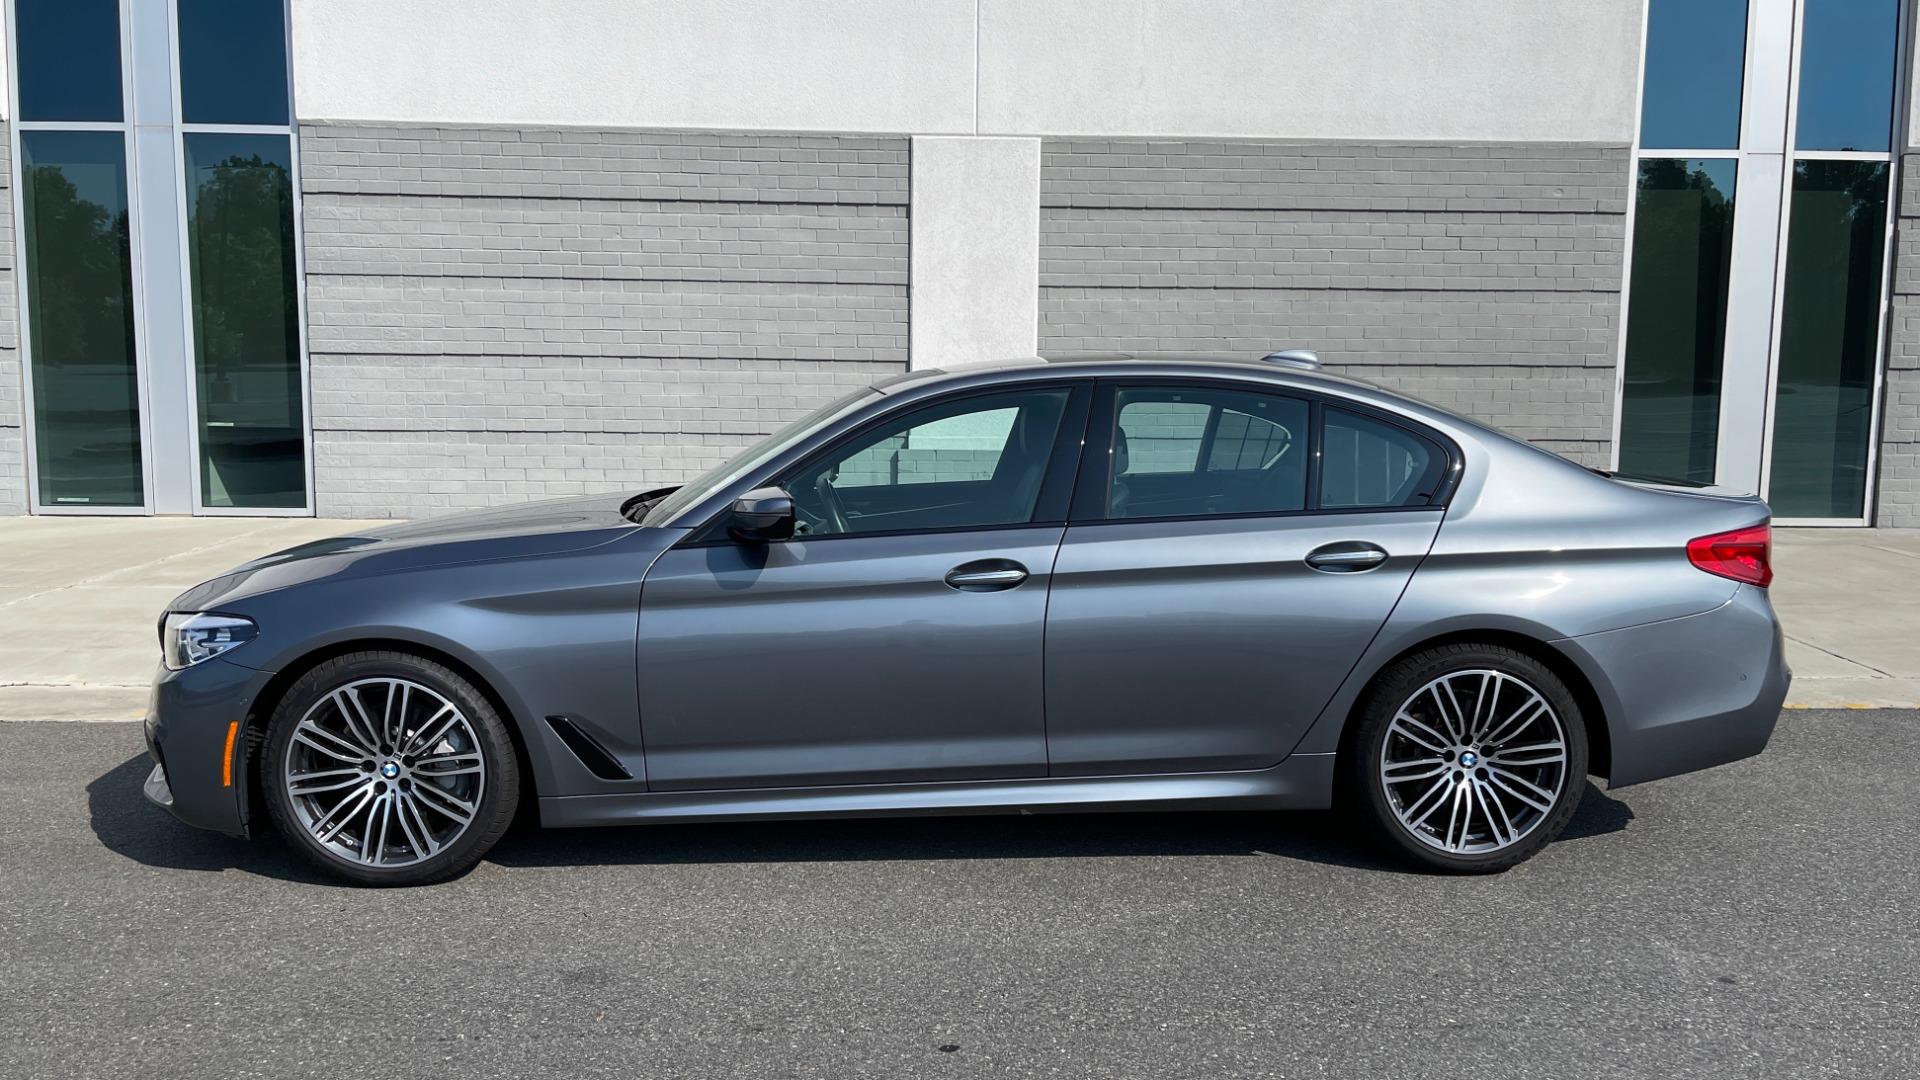 Used 2018 BMW 5 SERIES 540I XDRIVE M-SPORT / DRVR ASST / PDC / APPLE / HUD / H/K SND for sale $42,795 at Formula Imports in Charlotte NC 28227 4